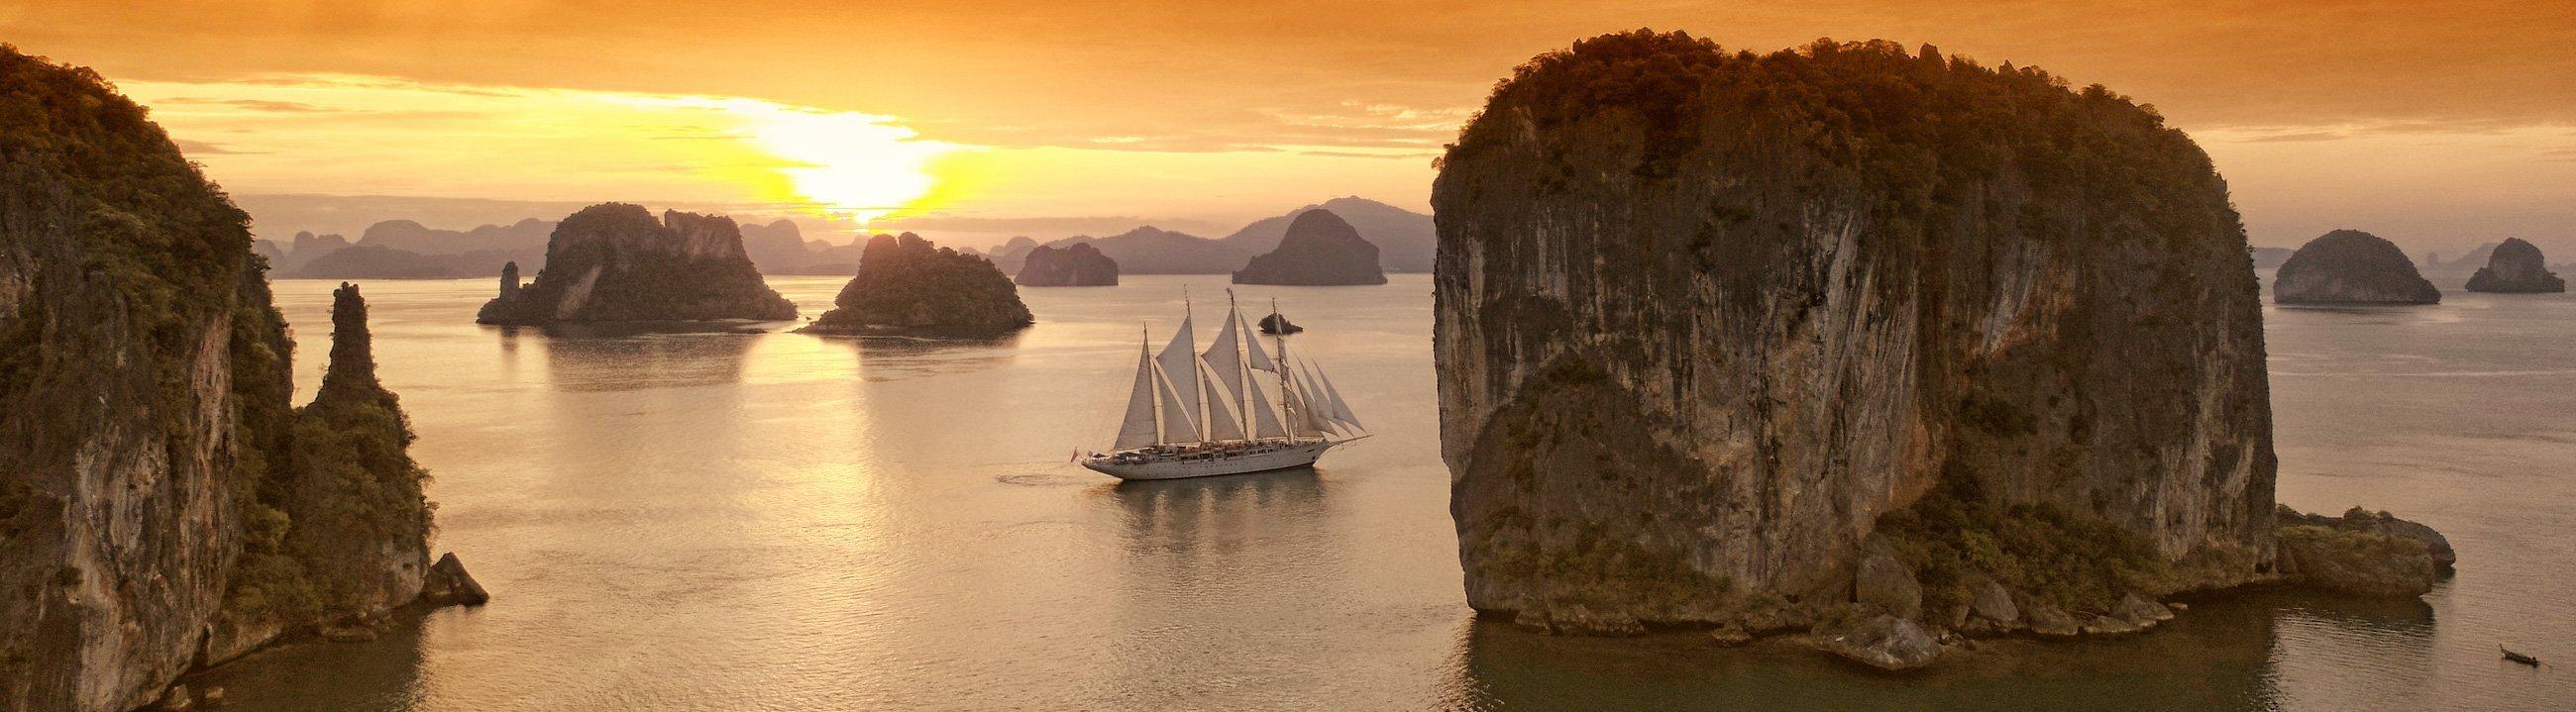 Star Clipper bei Sonnenaufgang in Thailand